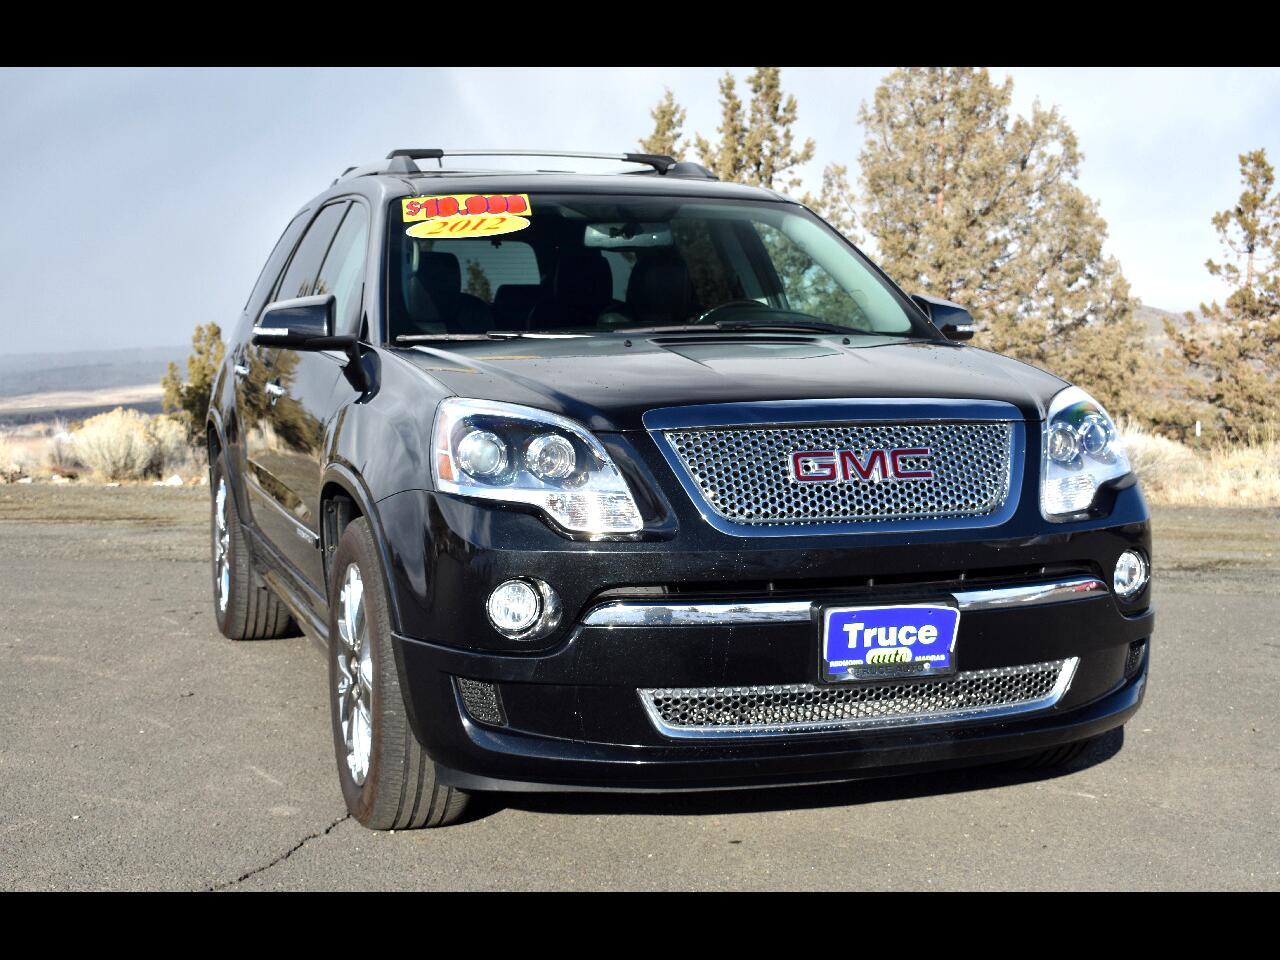 2012 GMC Acadia AWD 4dr Denali ****THIRD ROW***LOW MILES****